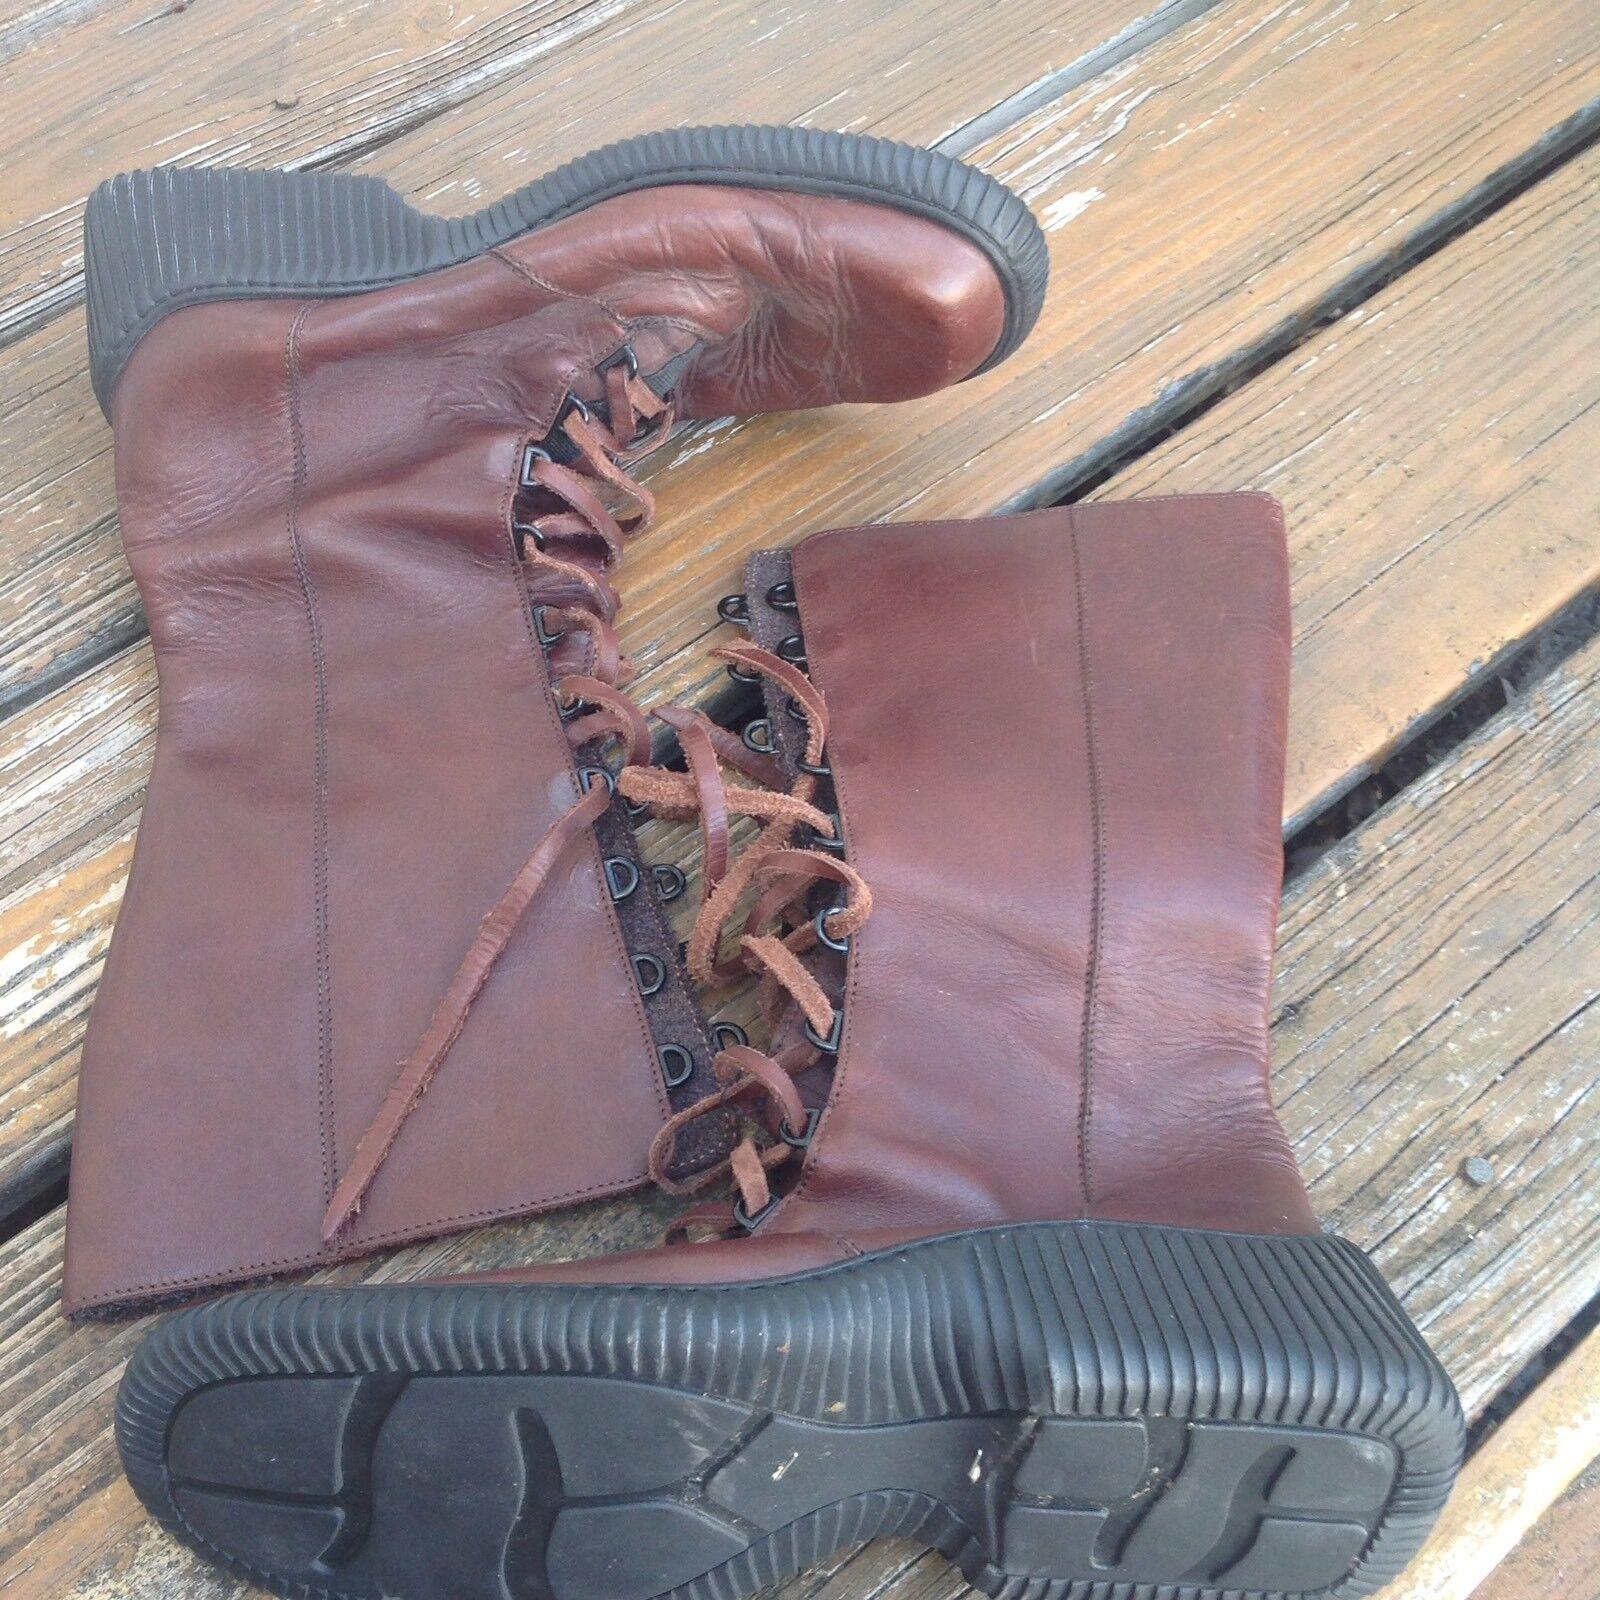 "Vintage Kenneth Cole Marroneee Leather Lace Up Moto Biker Biker Biker stivali Mens scarpe 12.25"" 3b0ac8"